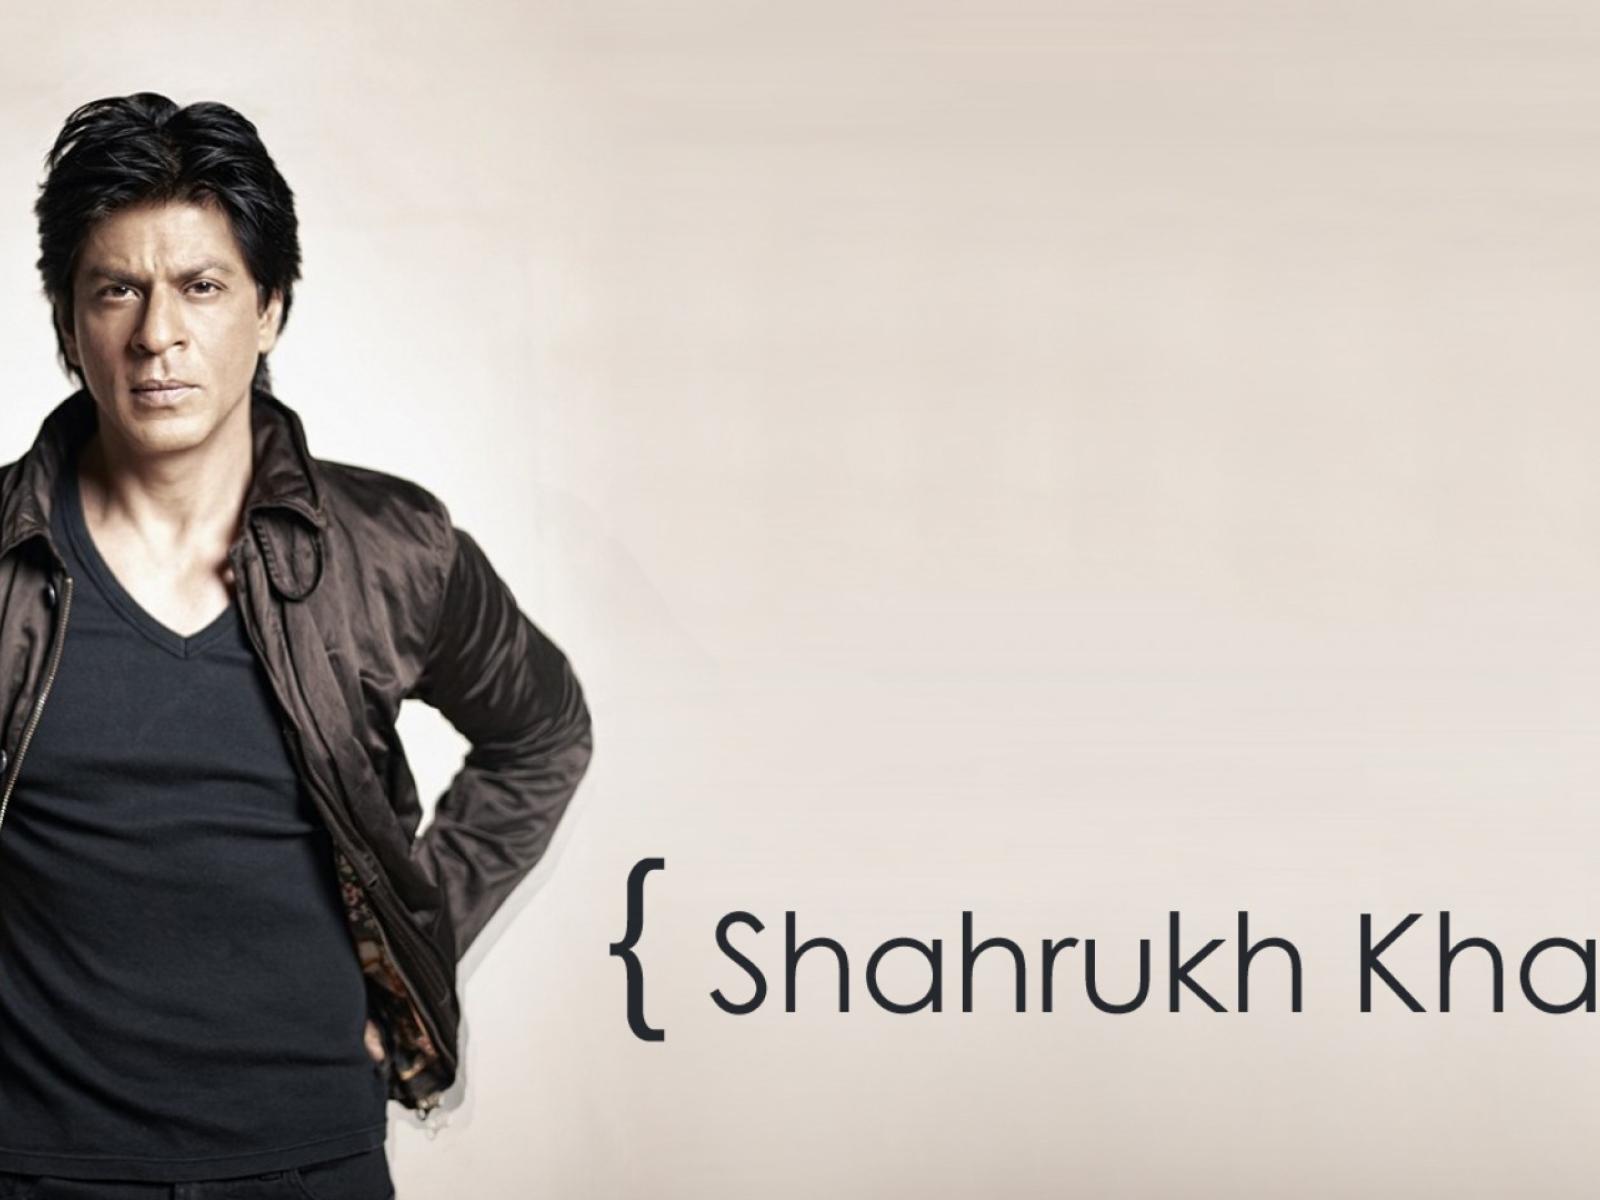 Download Shahrukh Khan Full Hd Wallpaper Gallery: Shah Rukh Khan Photoshoot, Full HD Wallpaper